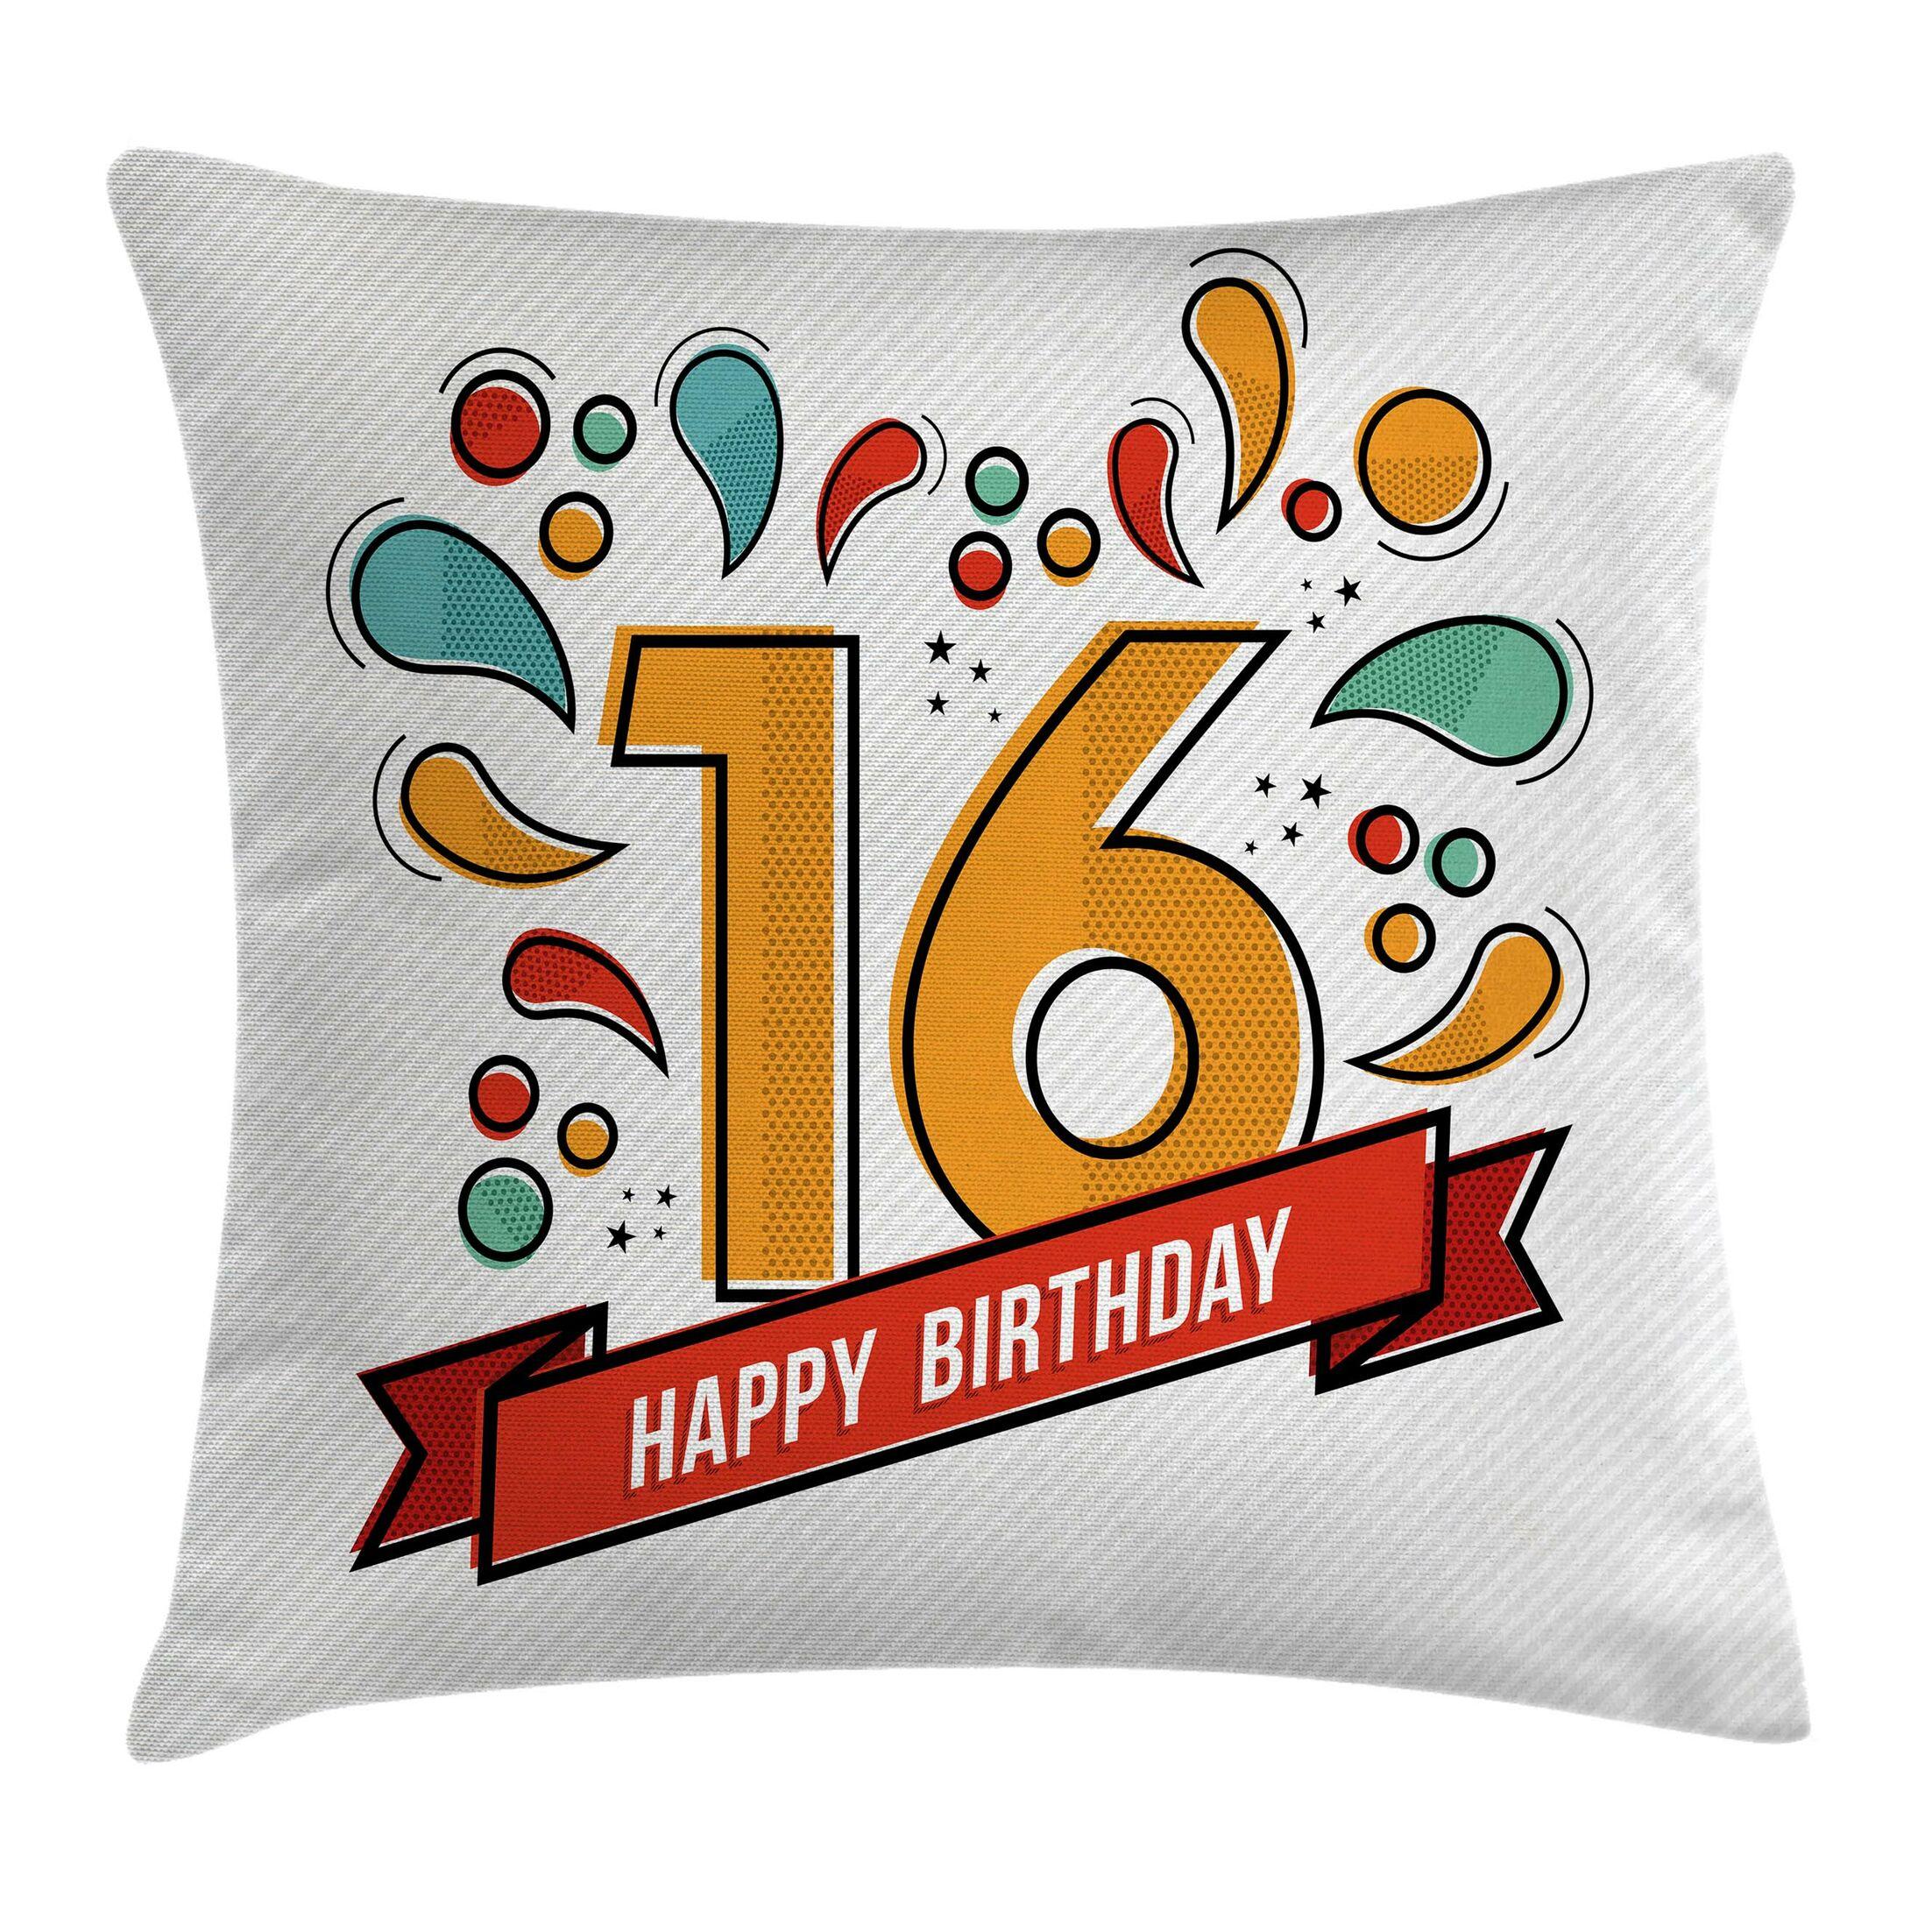 Festive Teen Modern Invitation Square Pillow Cover Size: 16